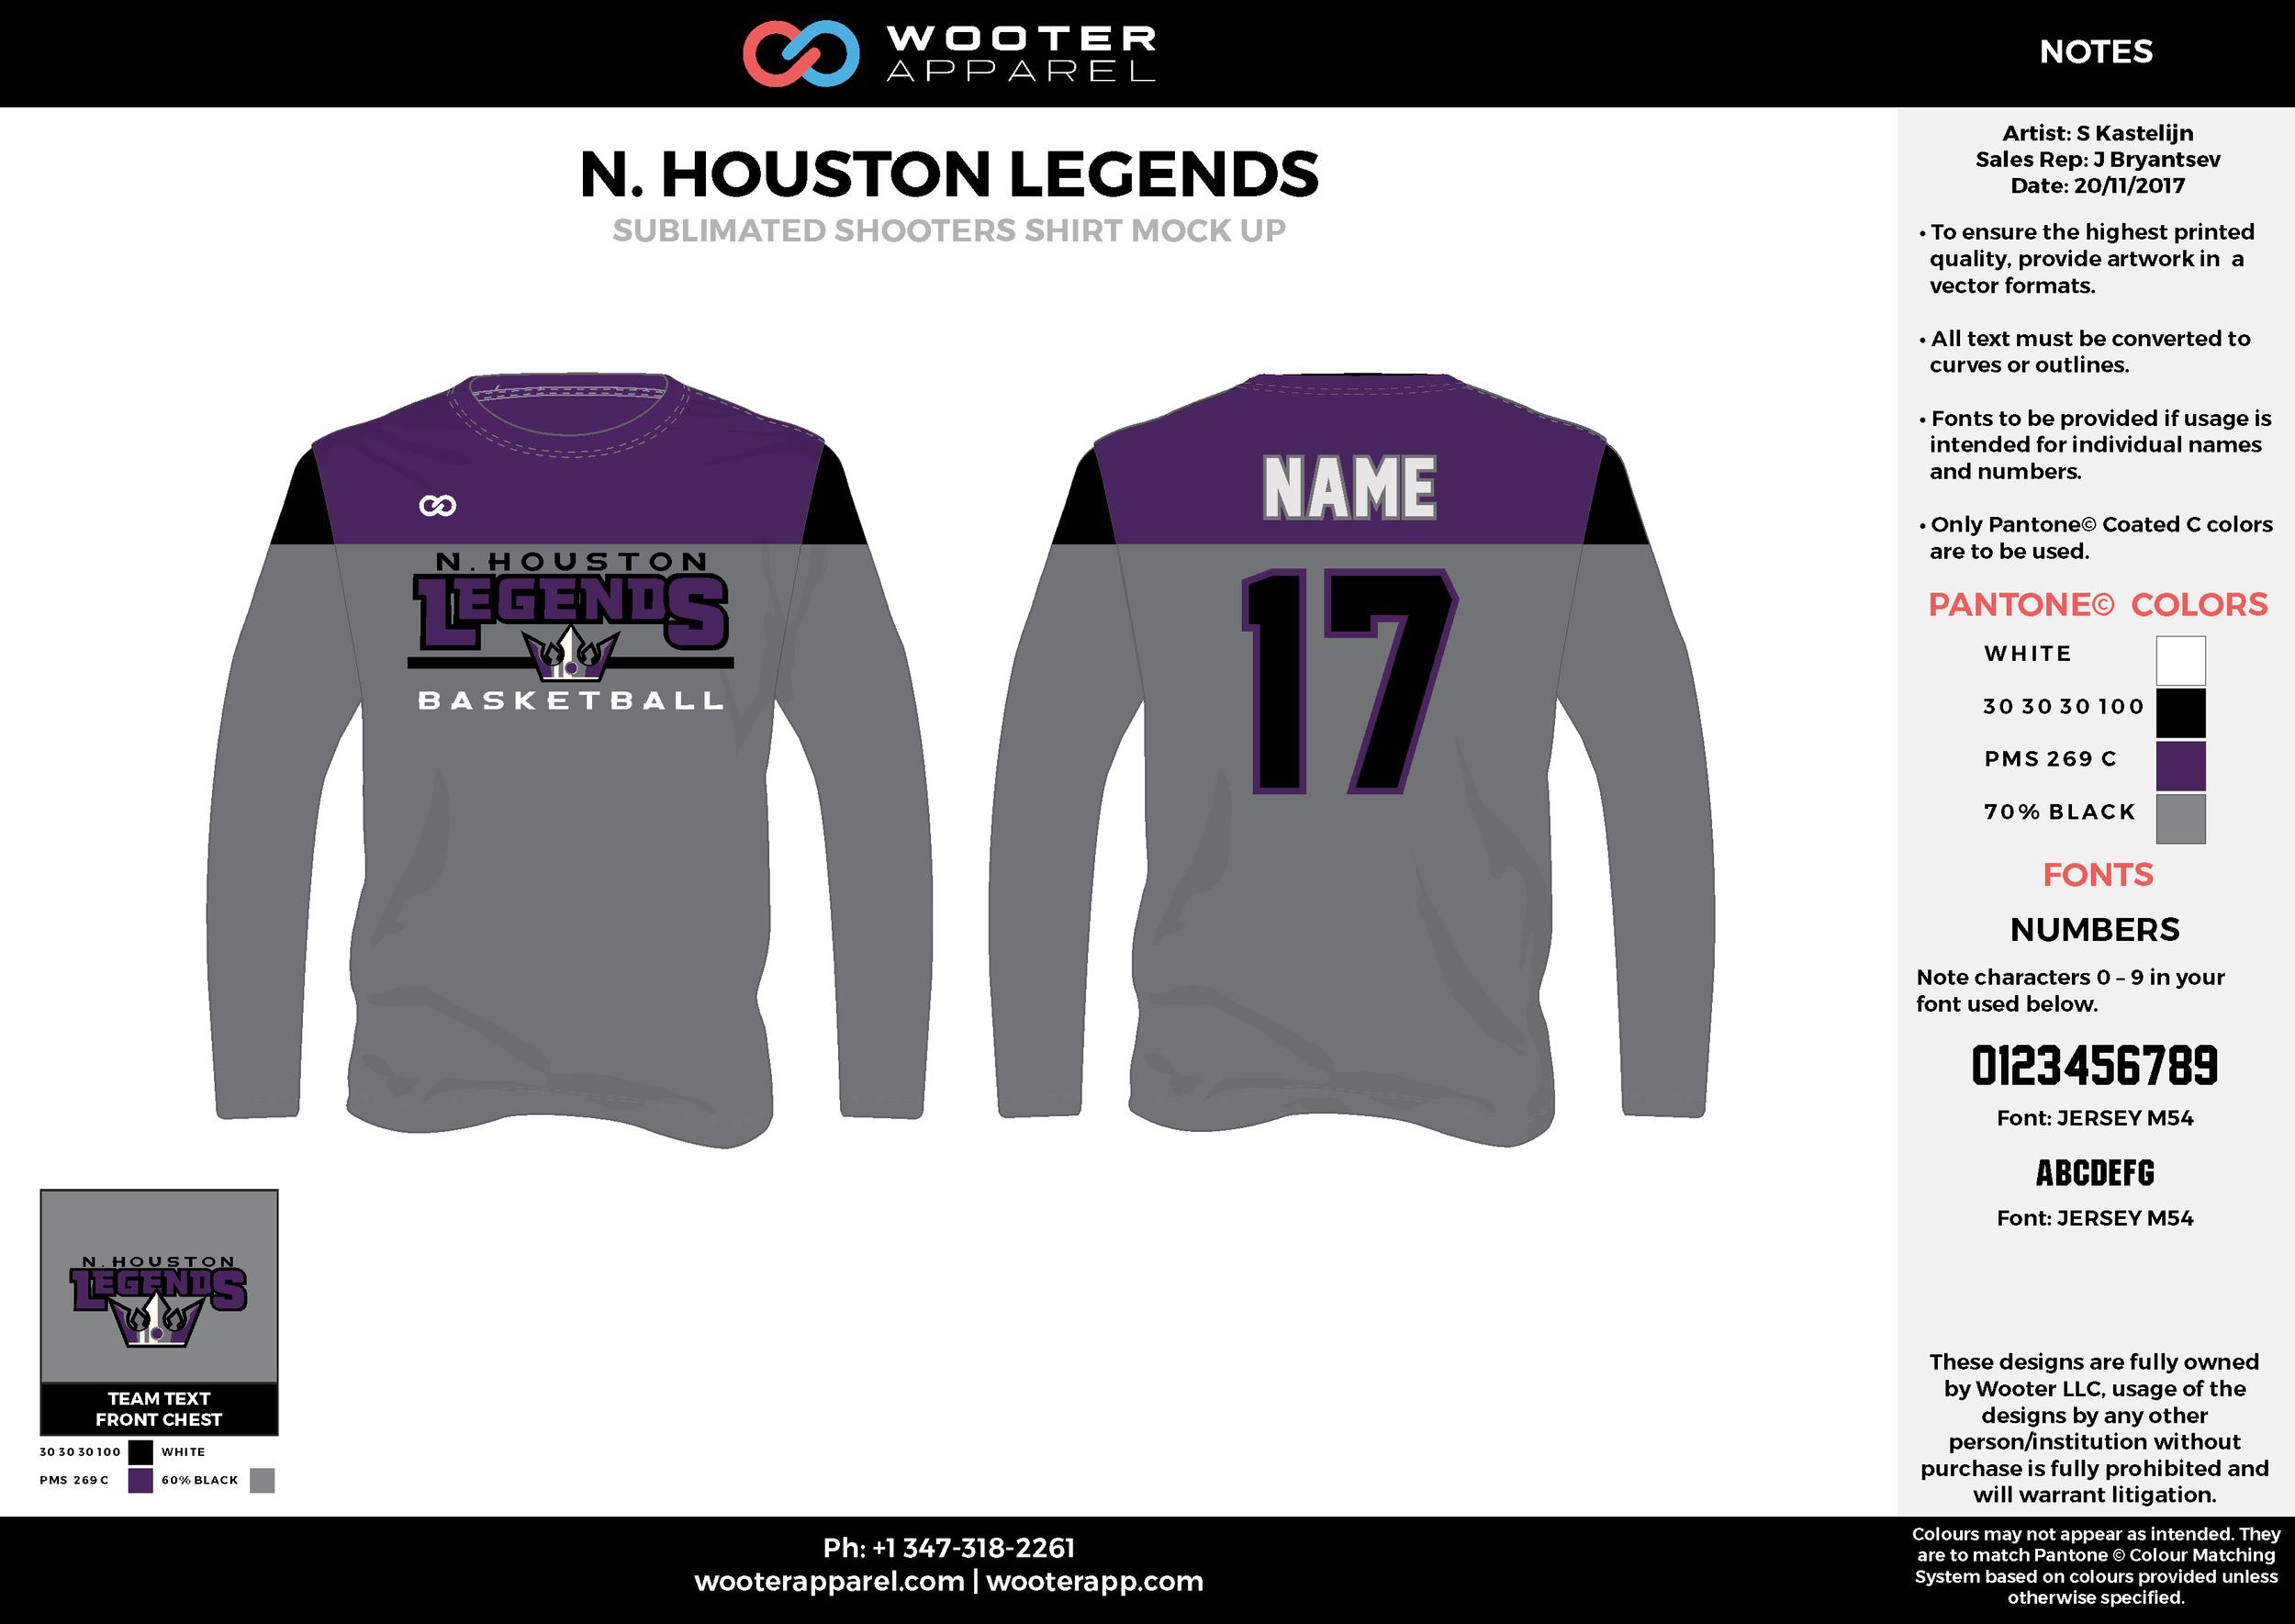 N. HOUSTON LEGENDS gray black purple Basketball Long Sleeve Shooting Shirt